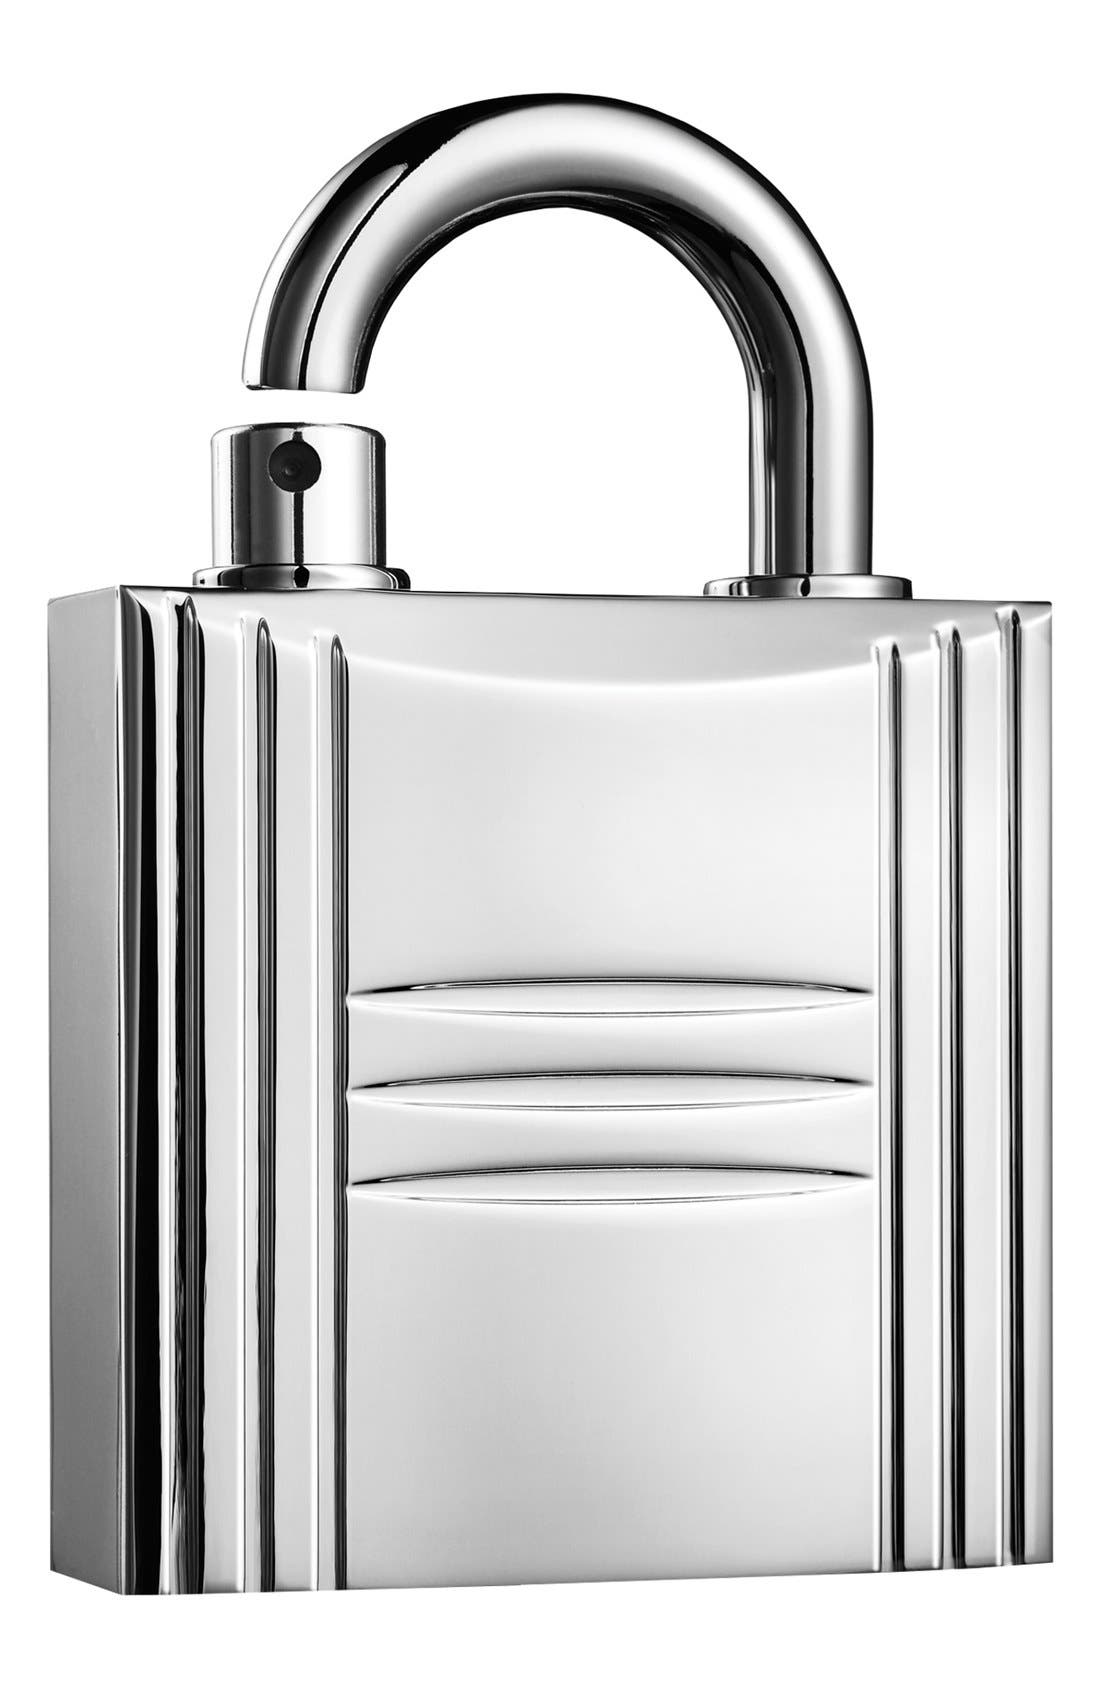 Hermès Pure perfume refillable lock spray